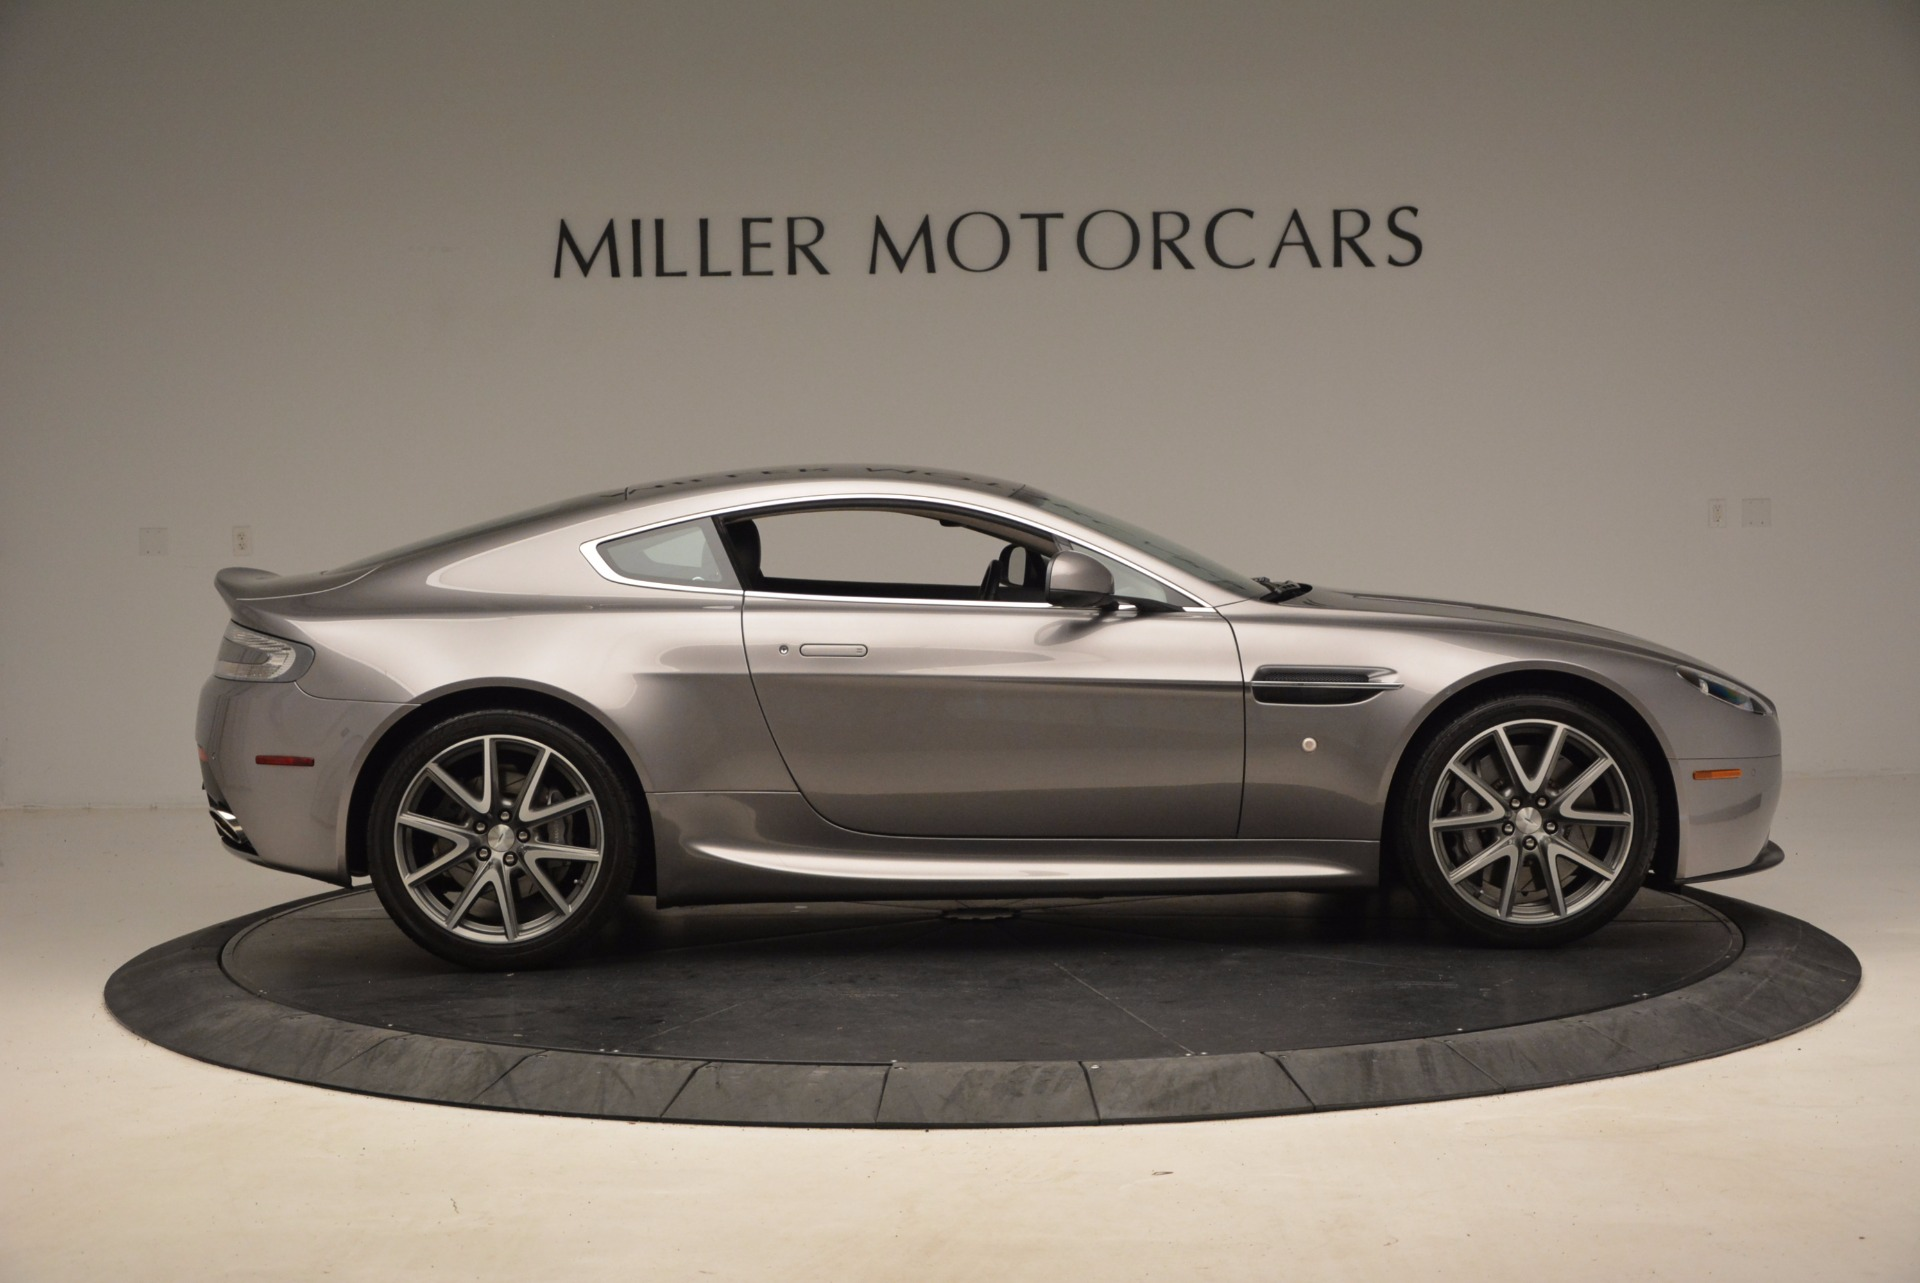 Used 2012 Aston Martin V8 Vantage  For Sale In Greenwich, CT 1497_p9